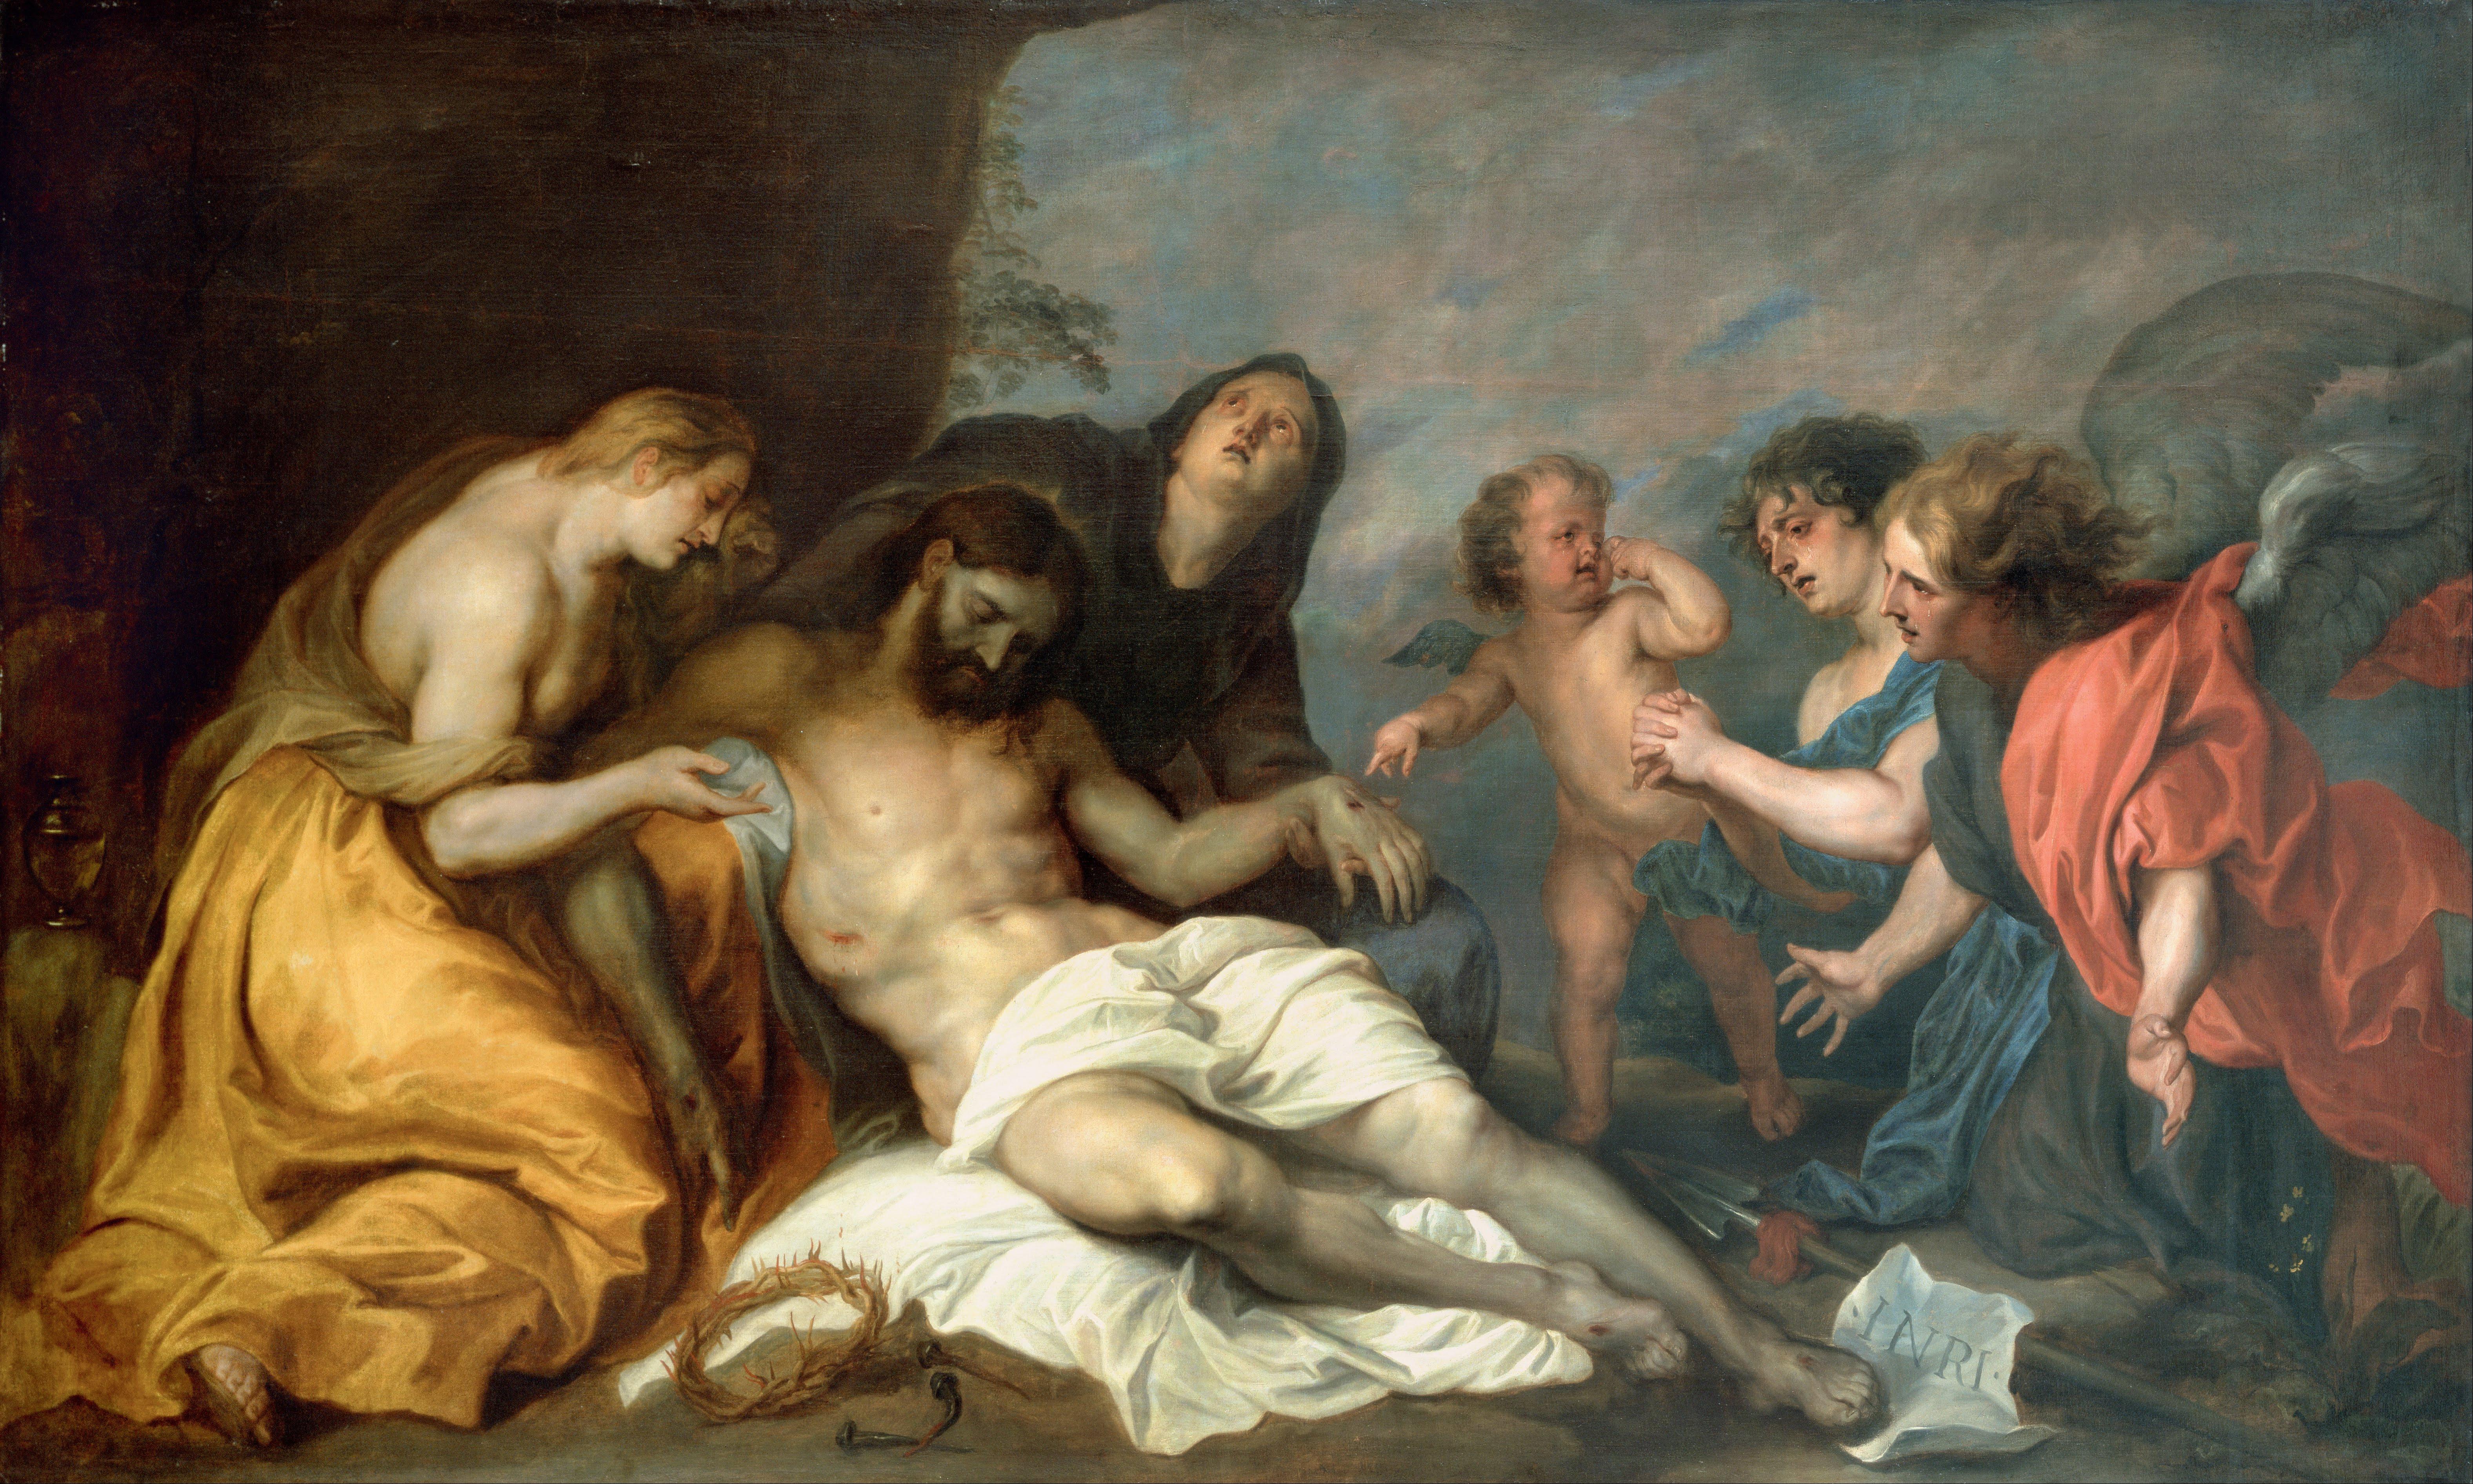 https://upload.wikimedia.org/wikipedia/commons/9/97/Anthony_van_Dyck_-_Lamentation_over_the_Dead_Christ_-_Google_Art_Project.jpg